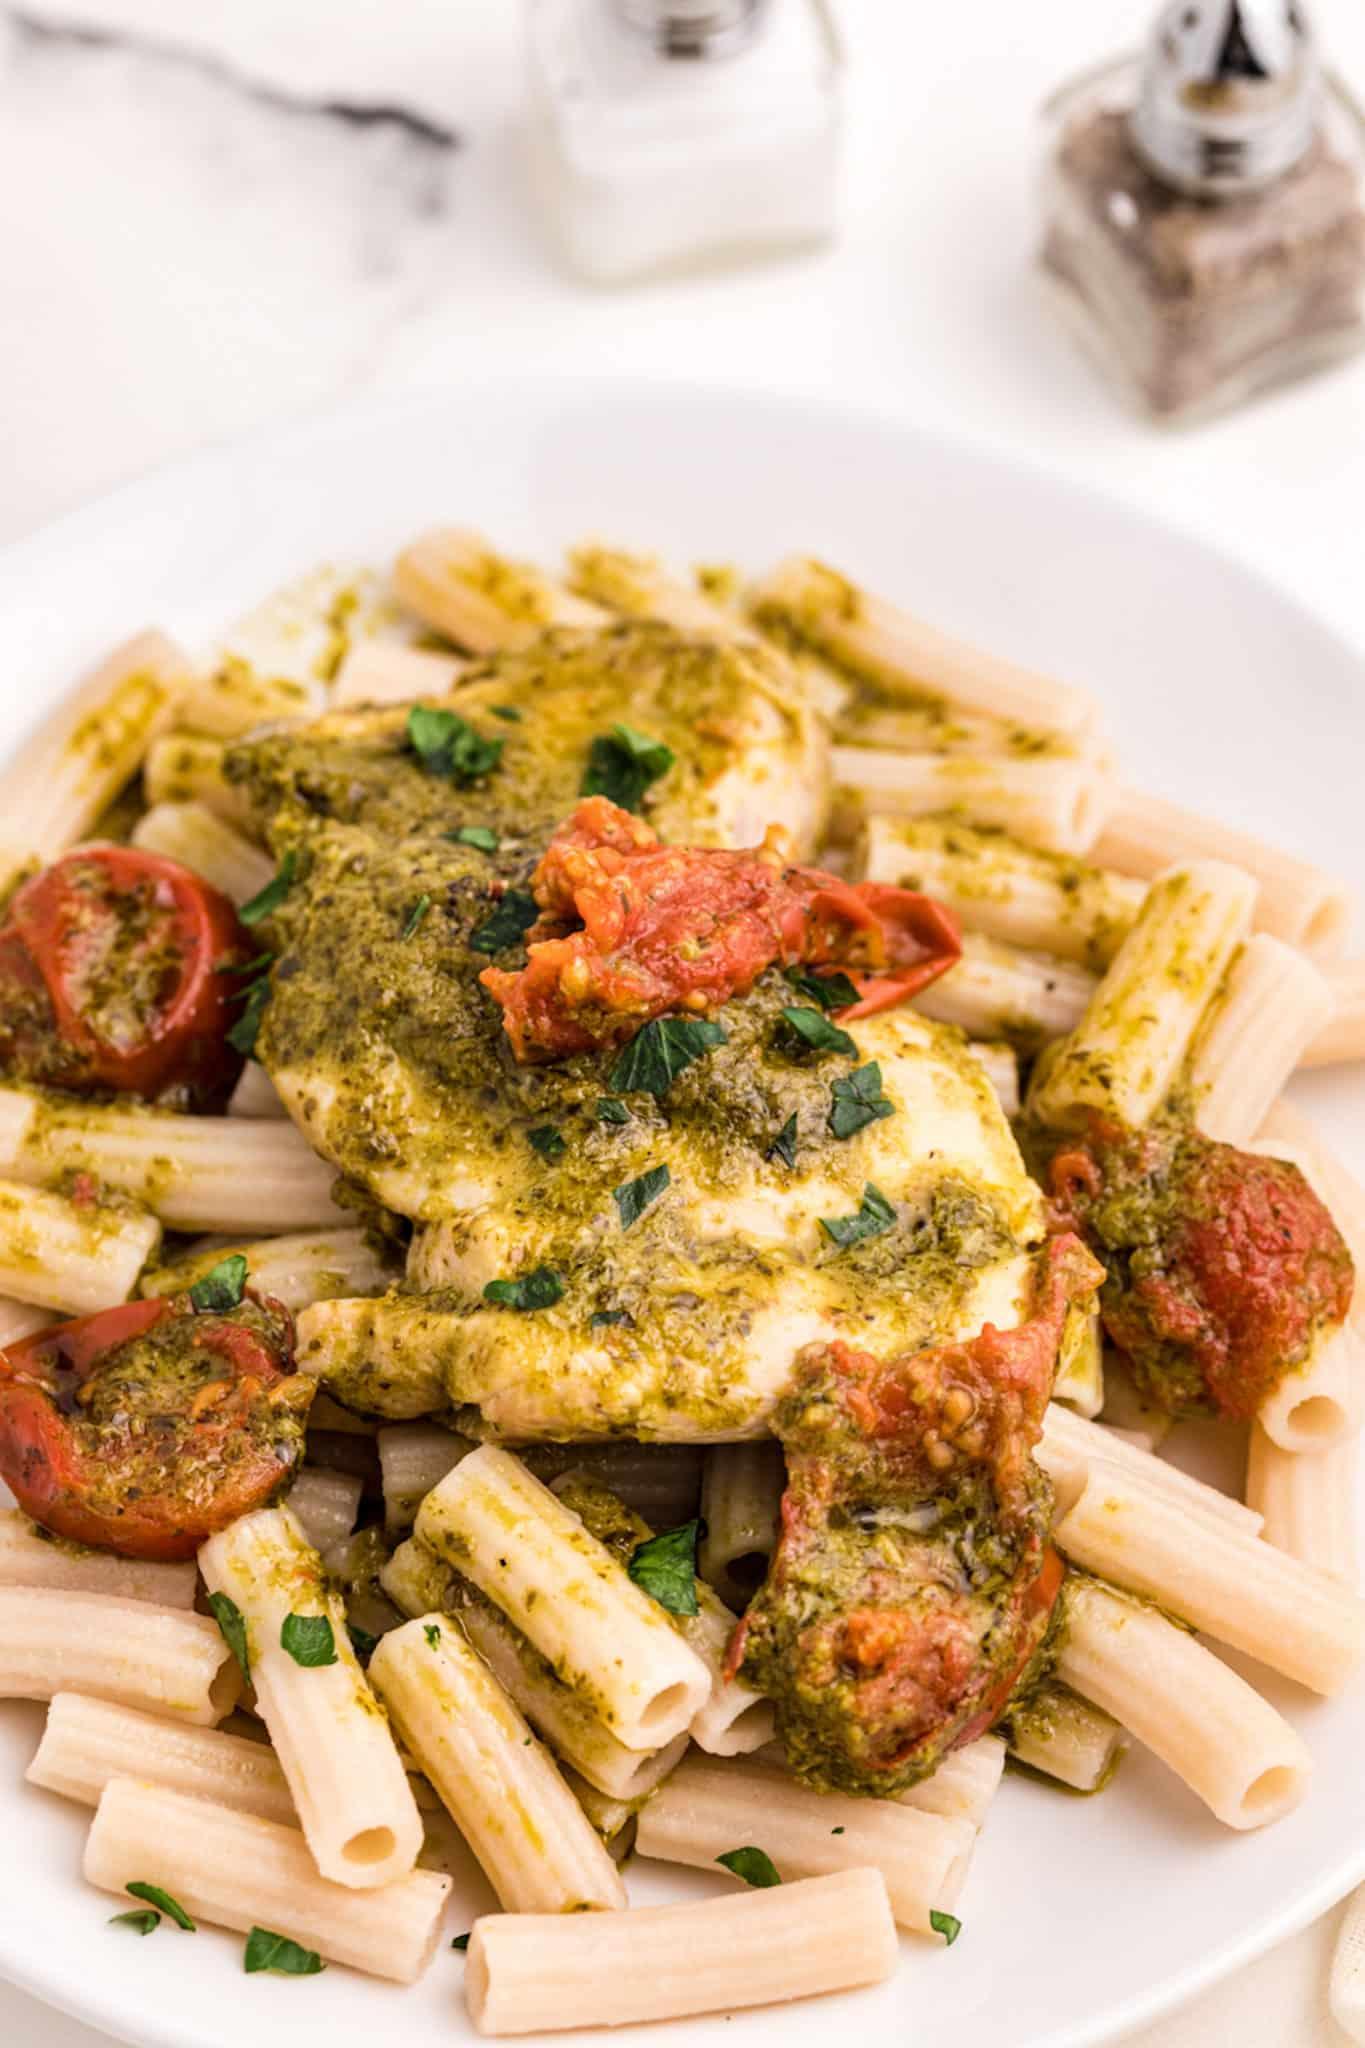 pesto chicken with pasta